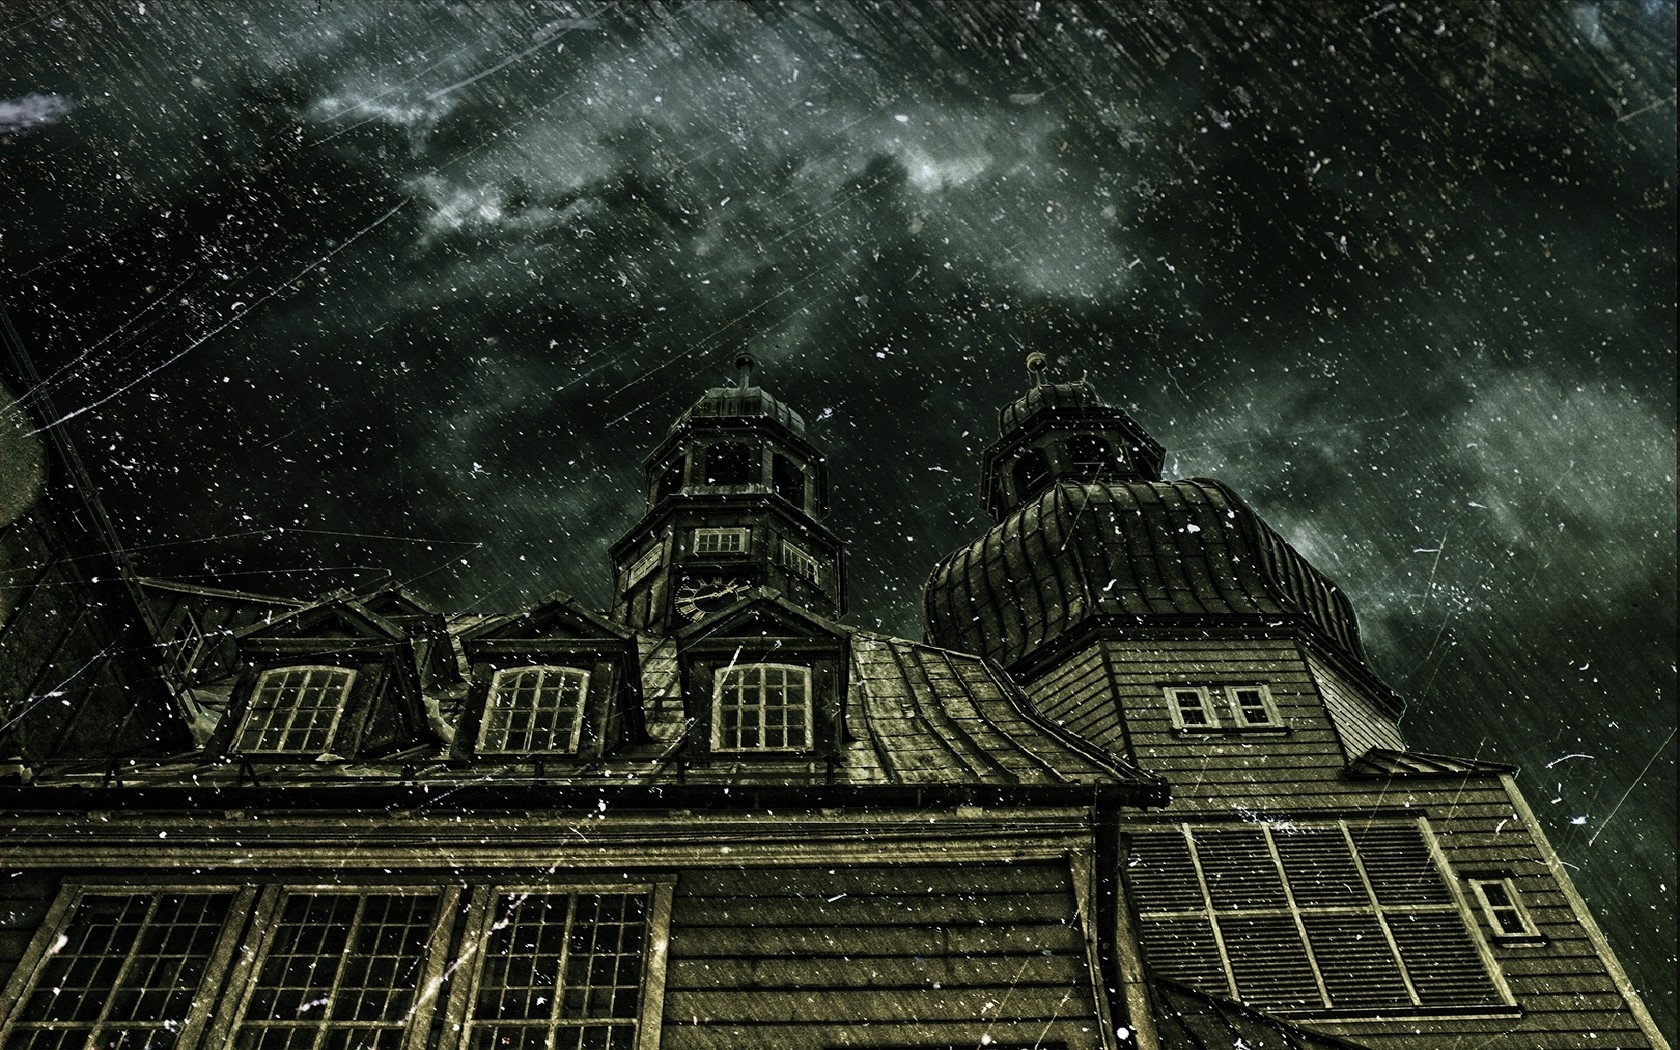 Haunted Horror Creepy Spooky Scary Halloween Haunted House Wallpaper 1680x1050